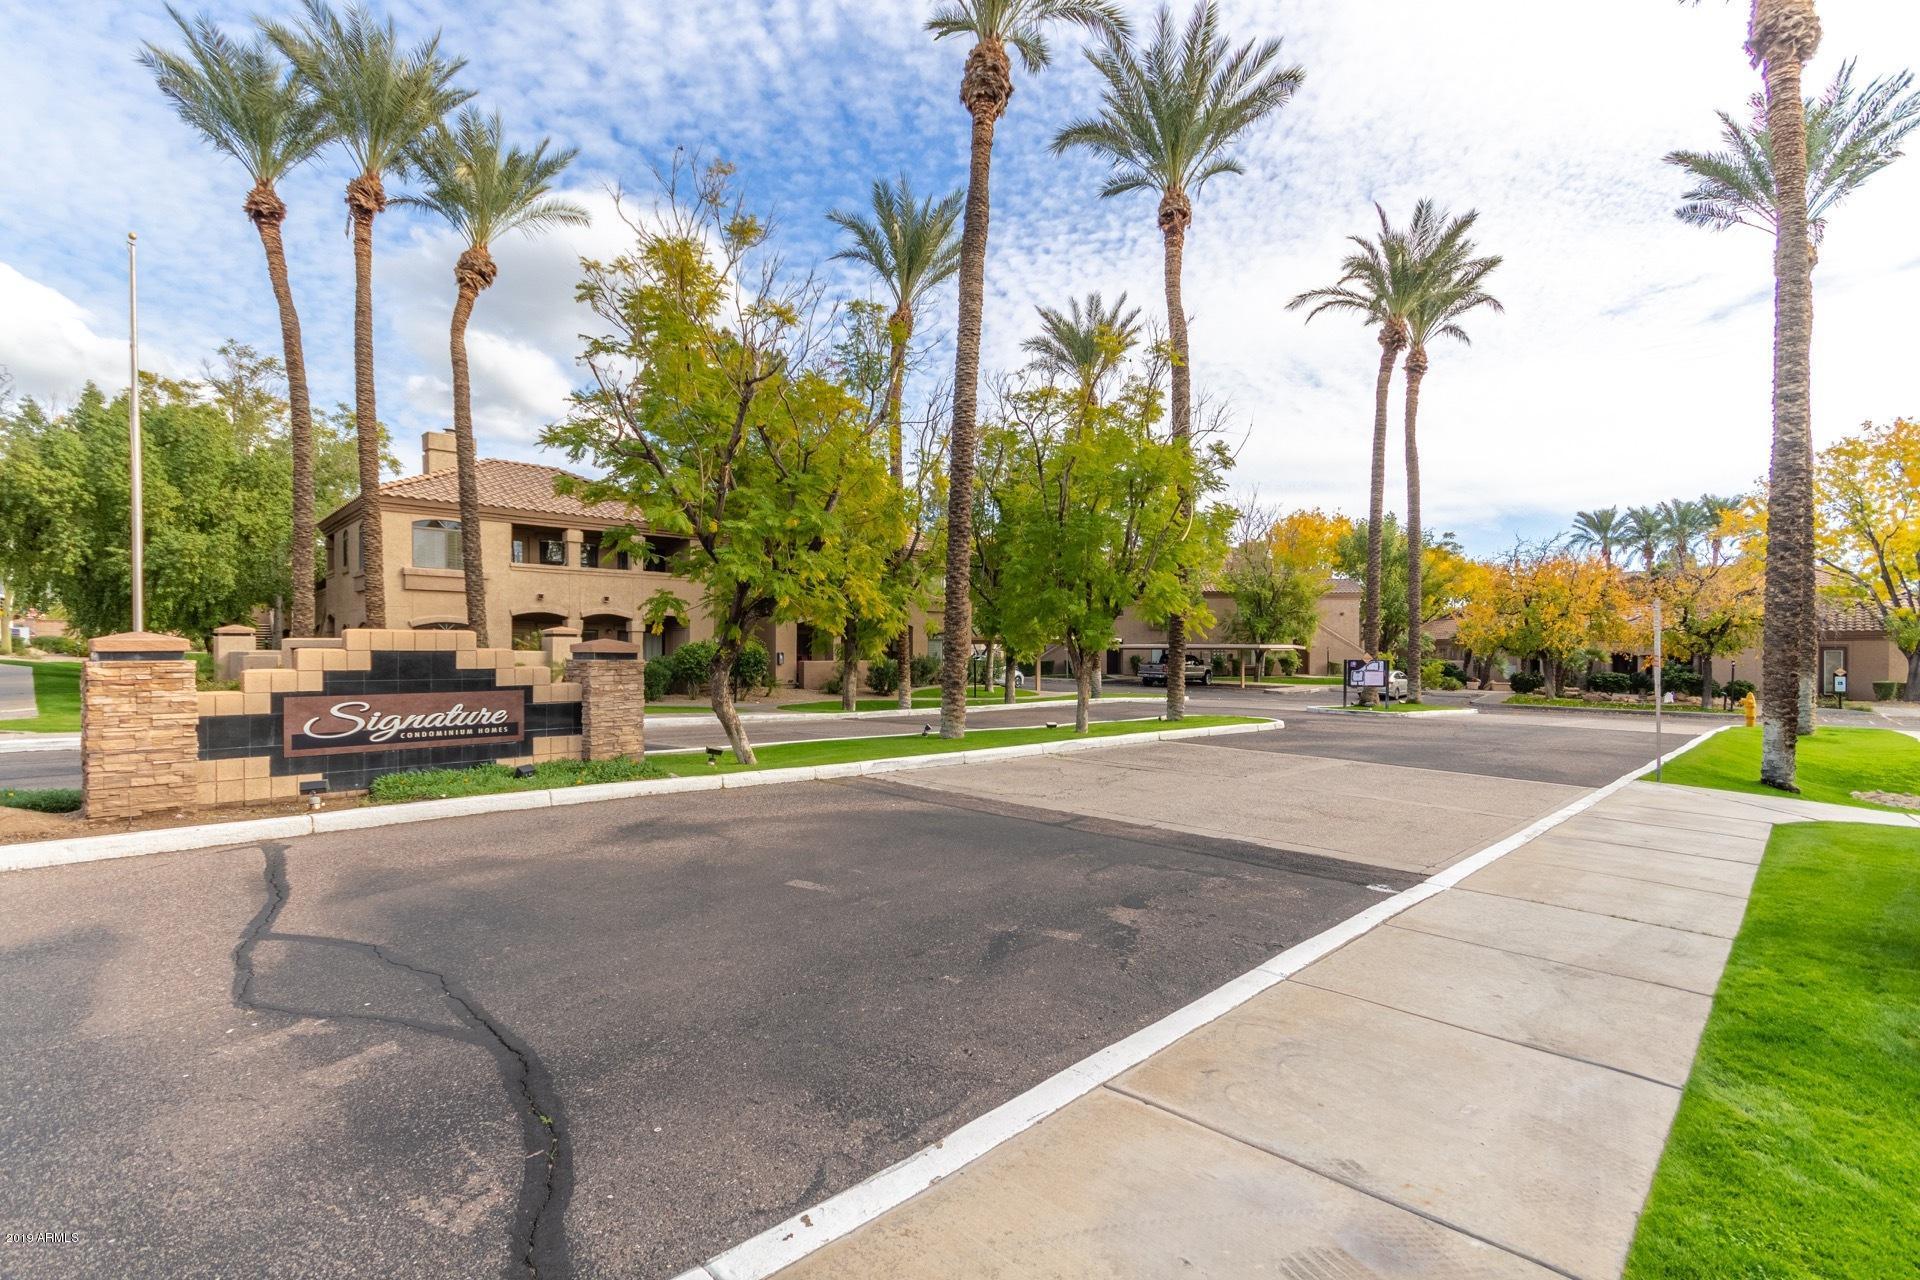 Photo of 15095 N THOMPSON PEAK Parkway #2100, Scottsdale, AZ 85260